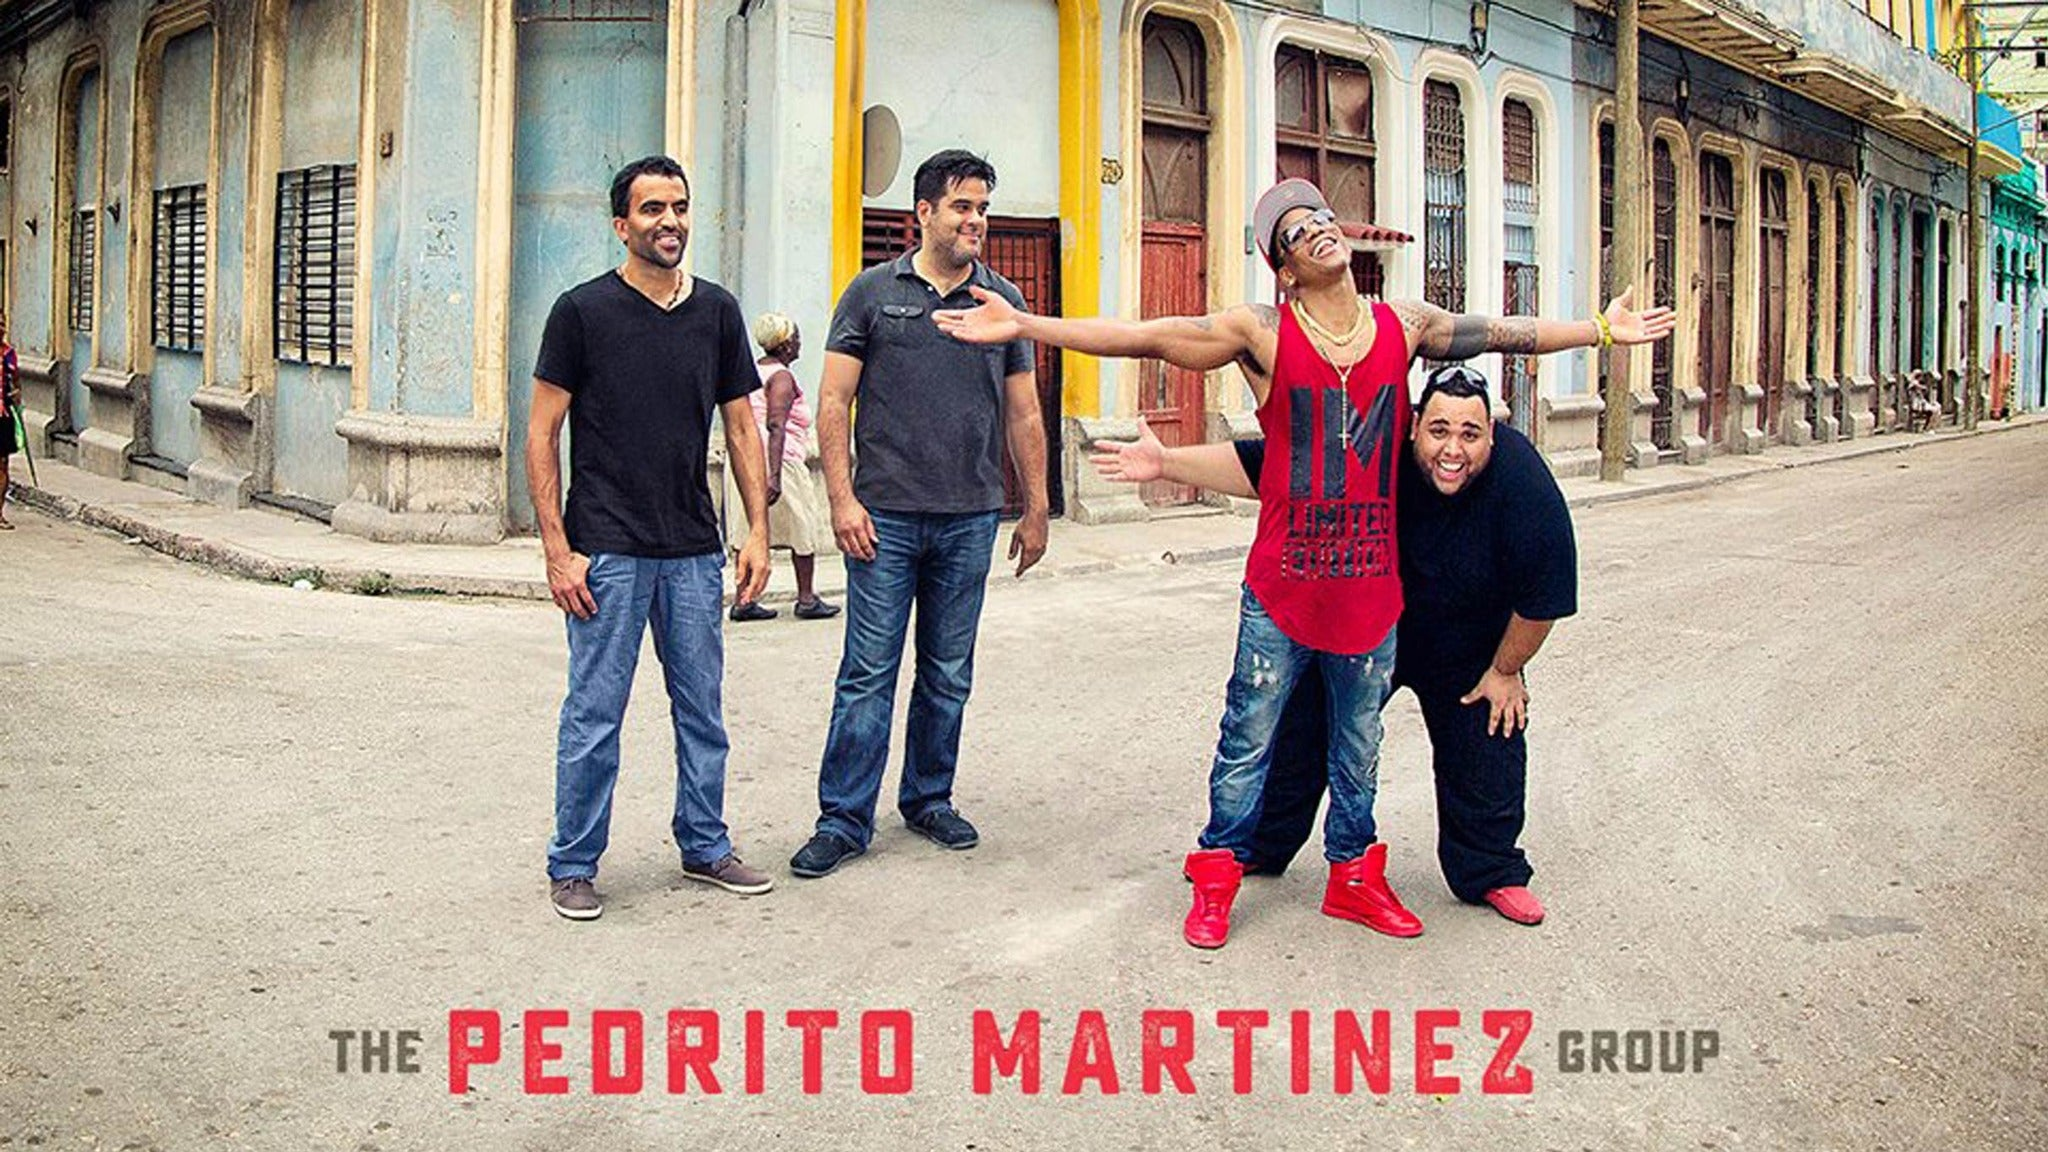 Pedrito Martinez Group Feat. Conrad Herwig